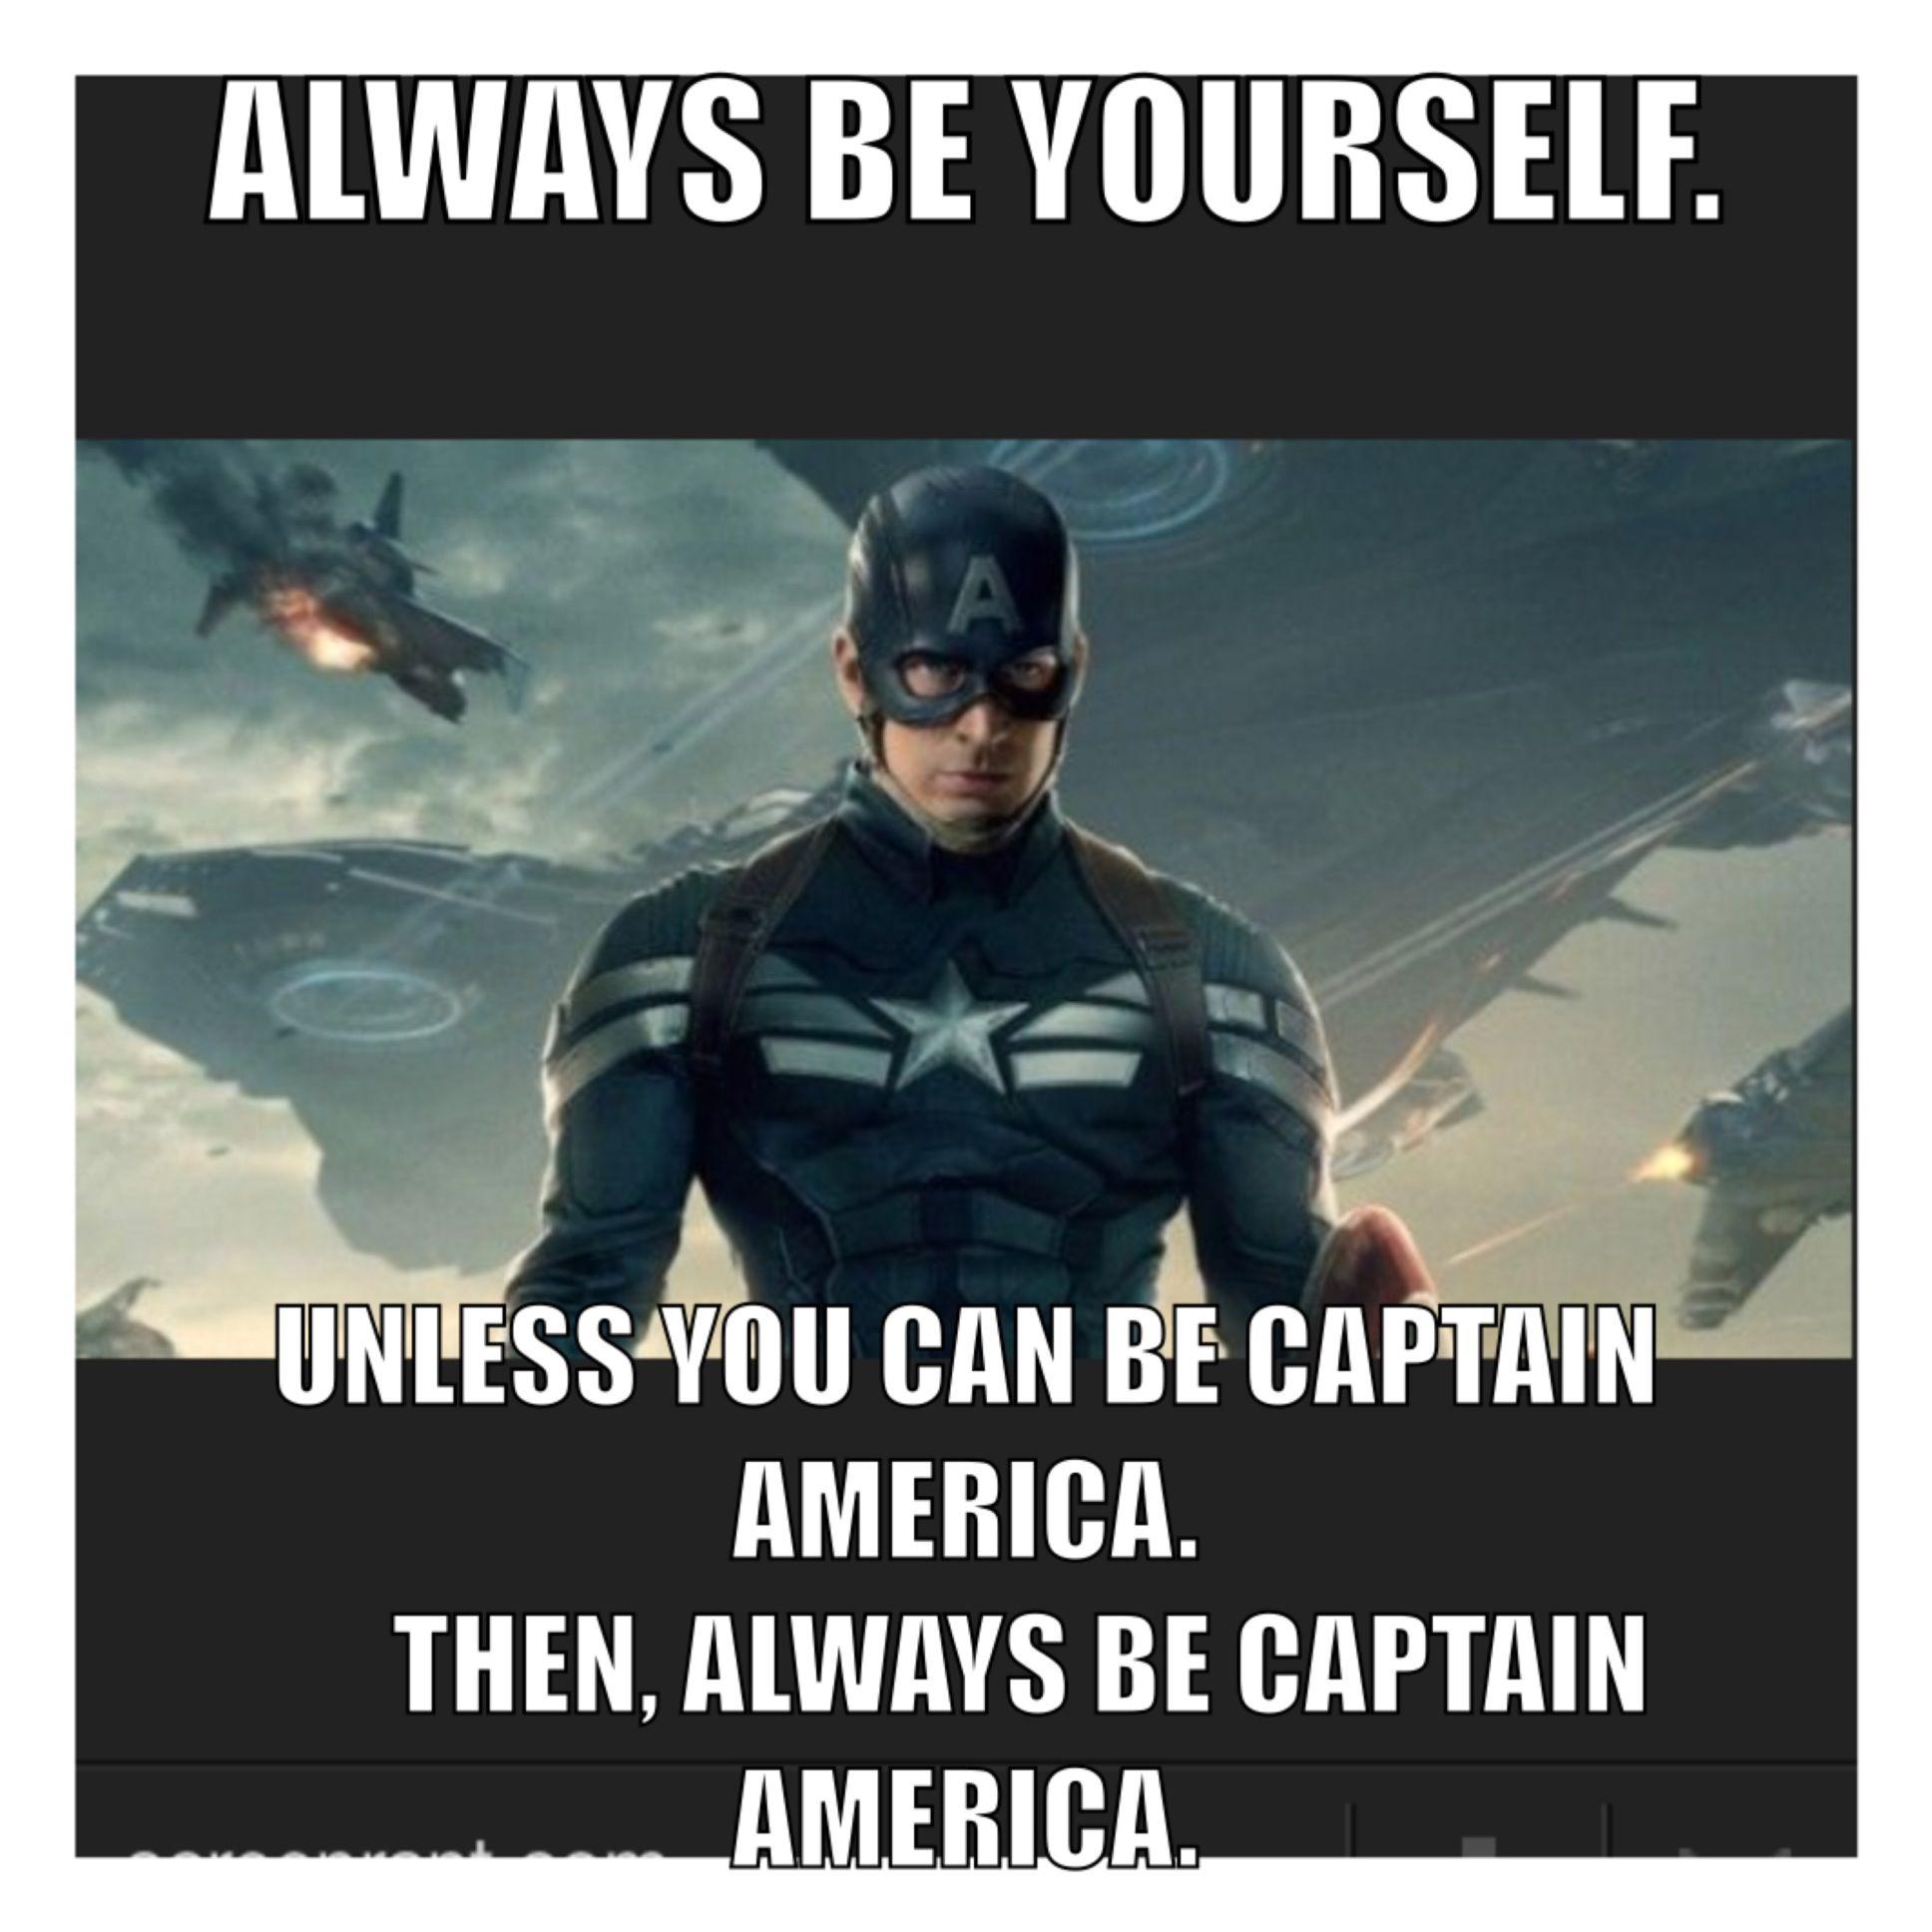 4c9f77a004583551d0a637e110be94c9 captain america meme memes to remember pinterest captain